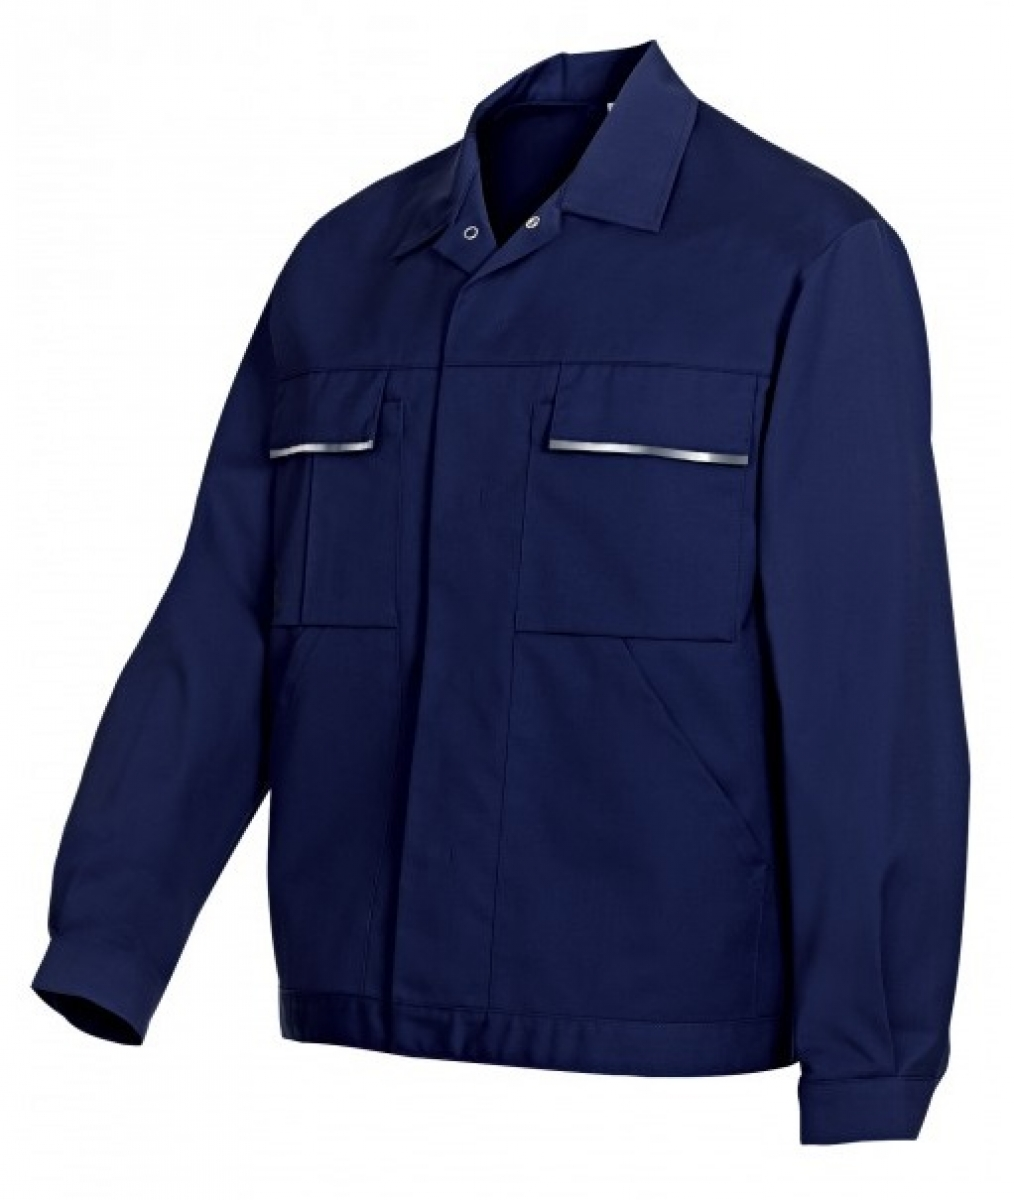 BP Arbeits-Berufs-Bund-Jacke, Blouson, königsblau-dunkelblau